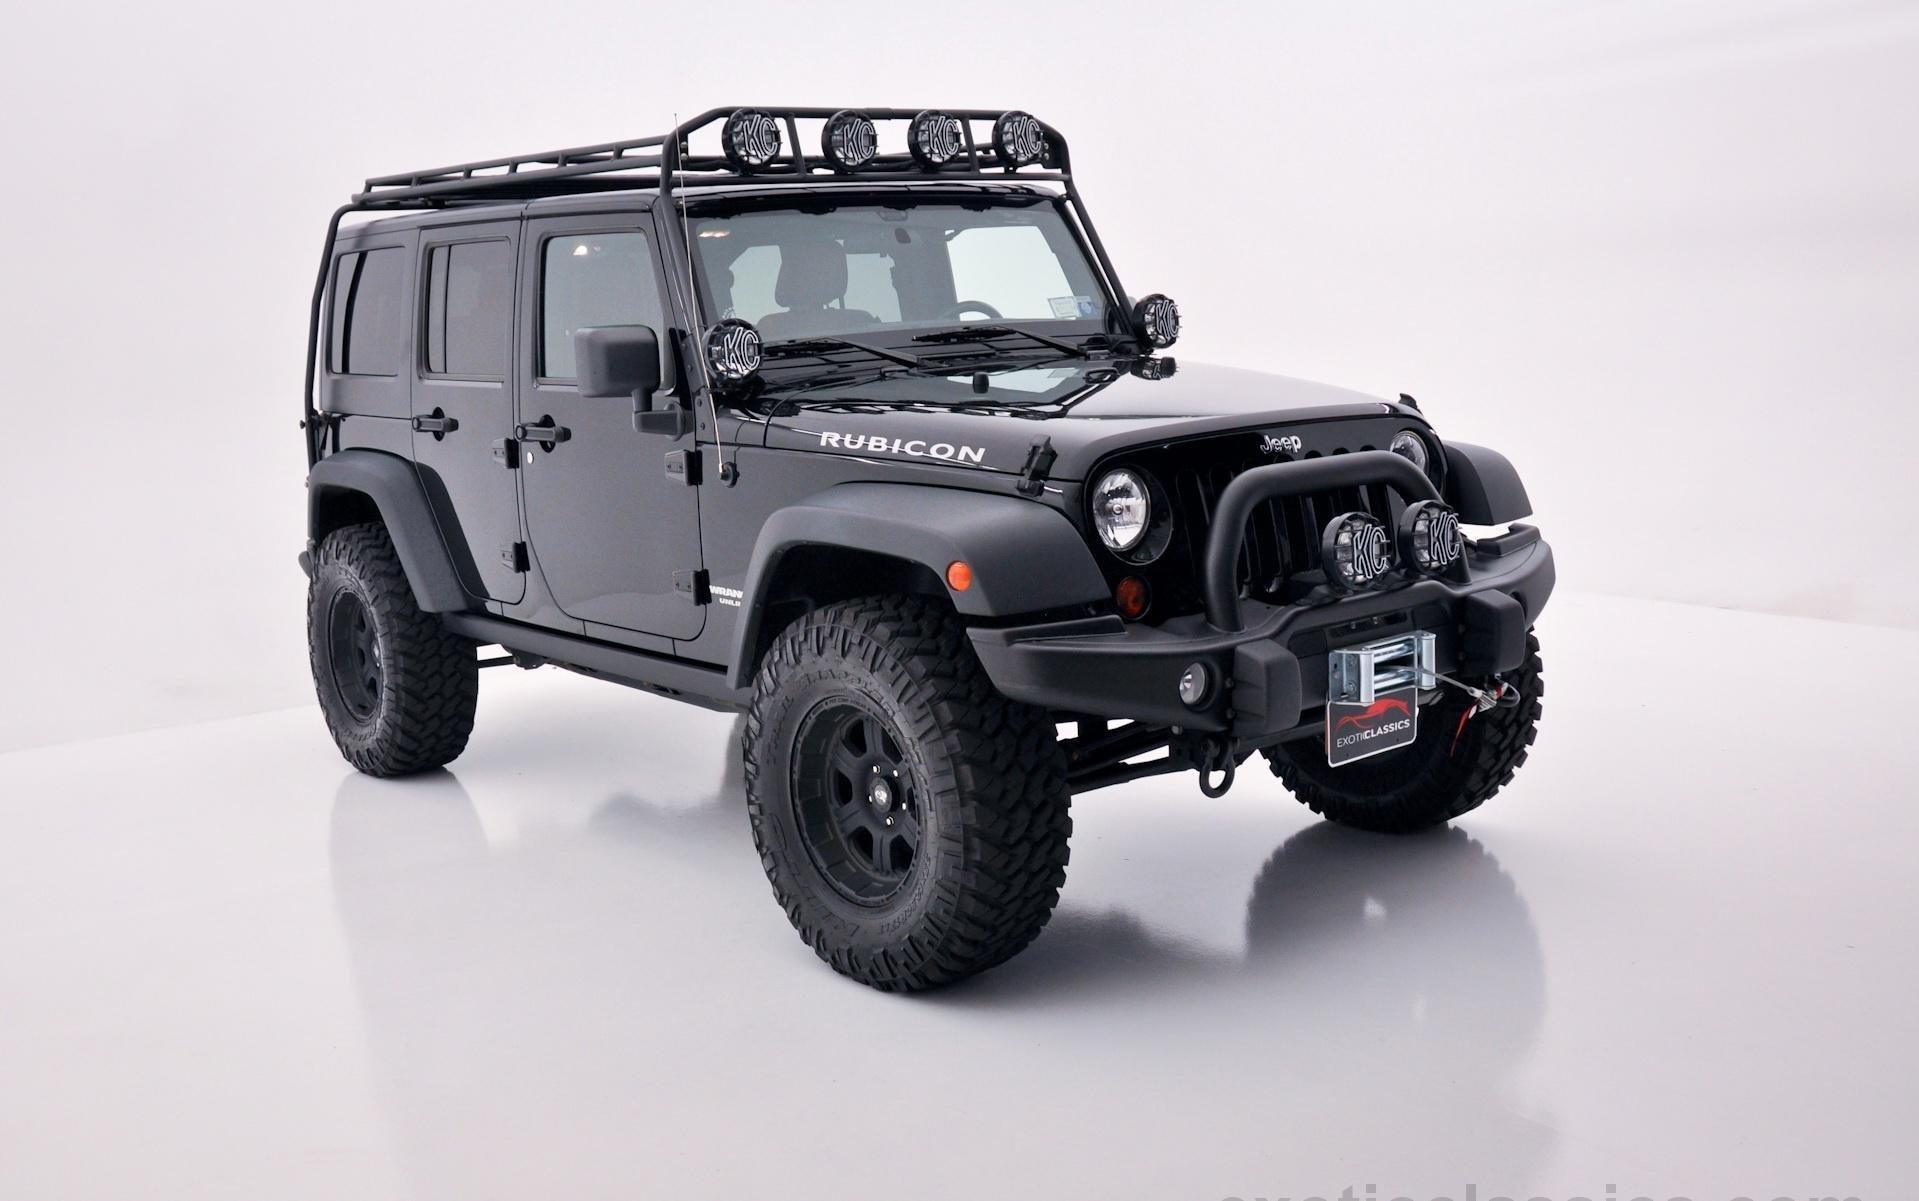 2011 jeep wrangler unlimited rubicon black 4wd all road 4x4 cars wallpaper 1919x1201 711418. Black Bedroom Furniture Sets. Home Design Ideas